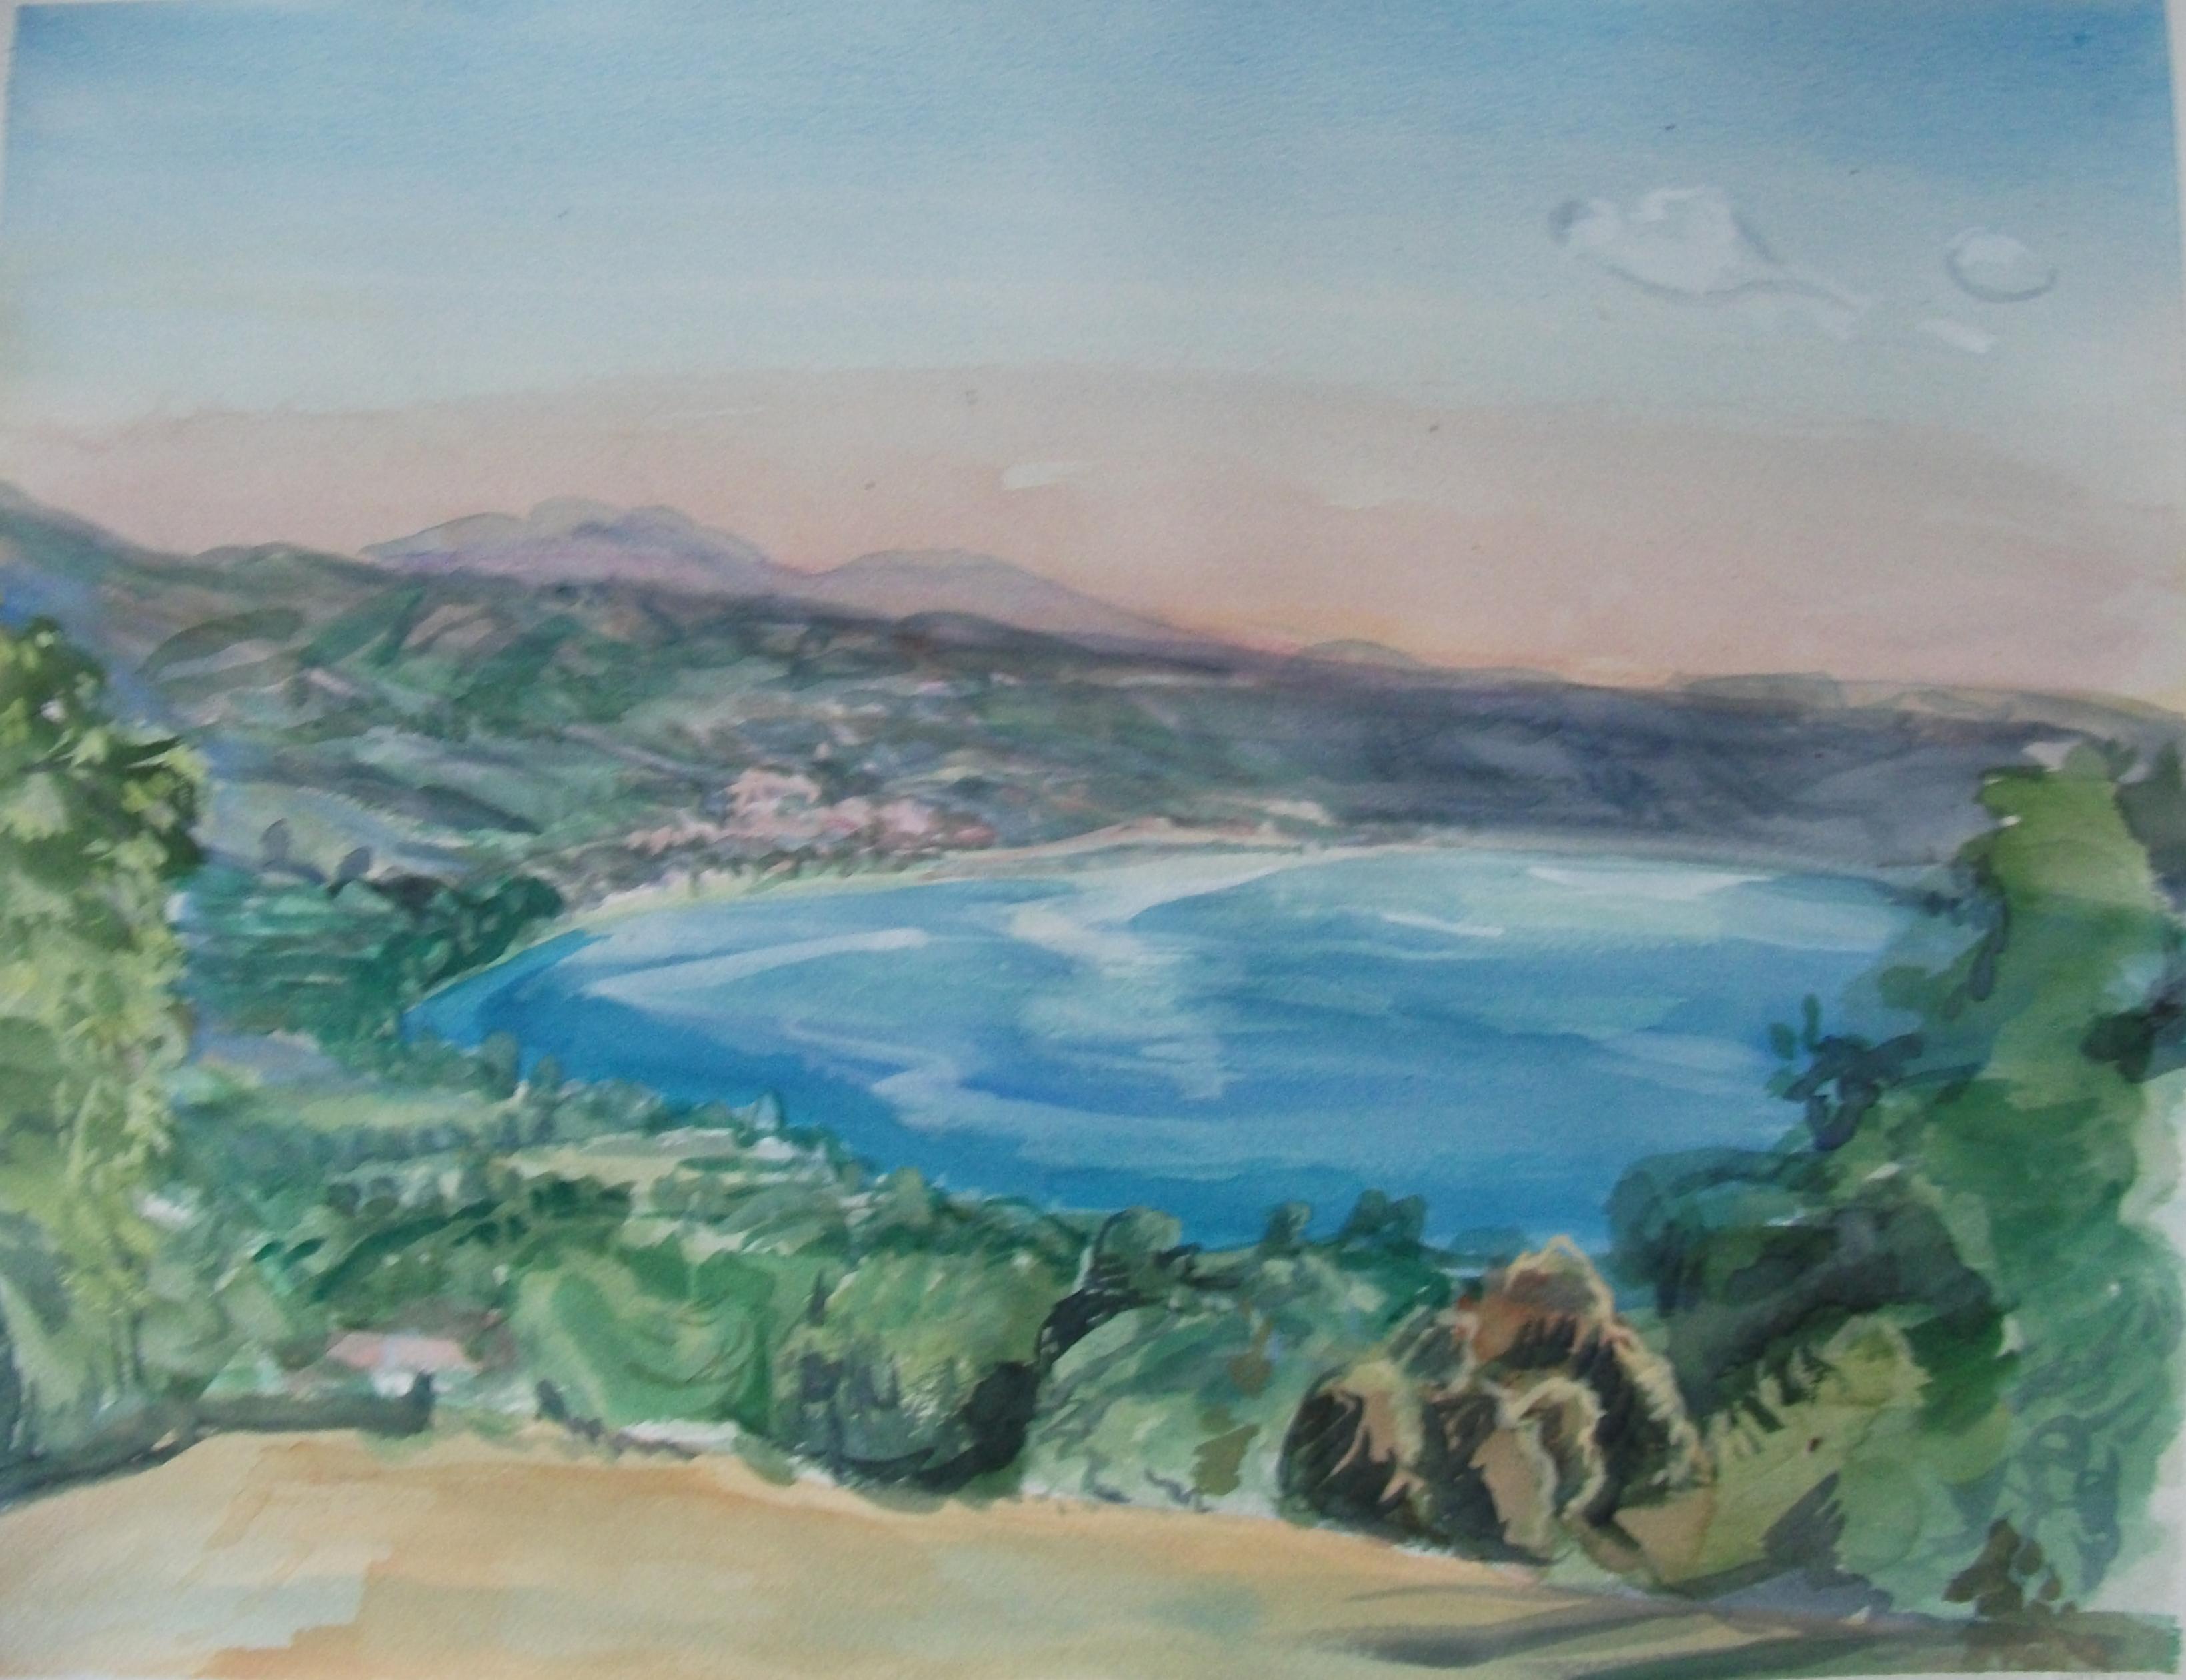 Bolsena watercolour on Arches paper-57x75cm